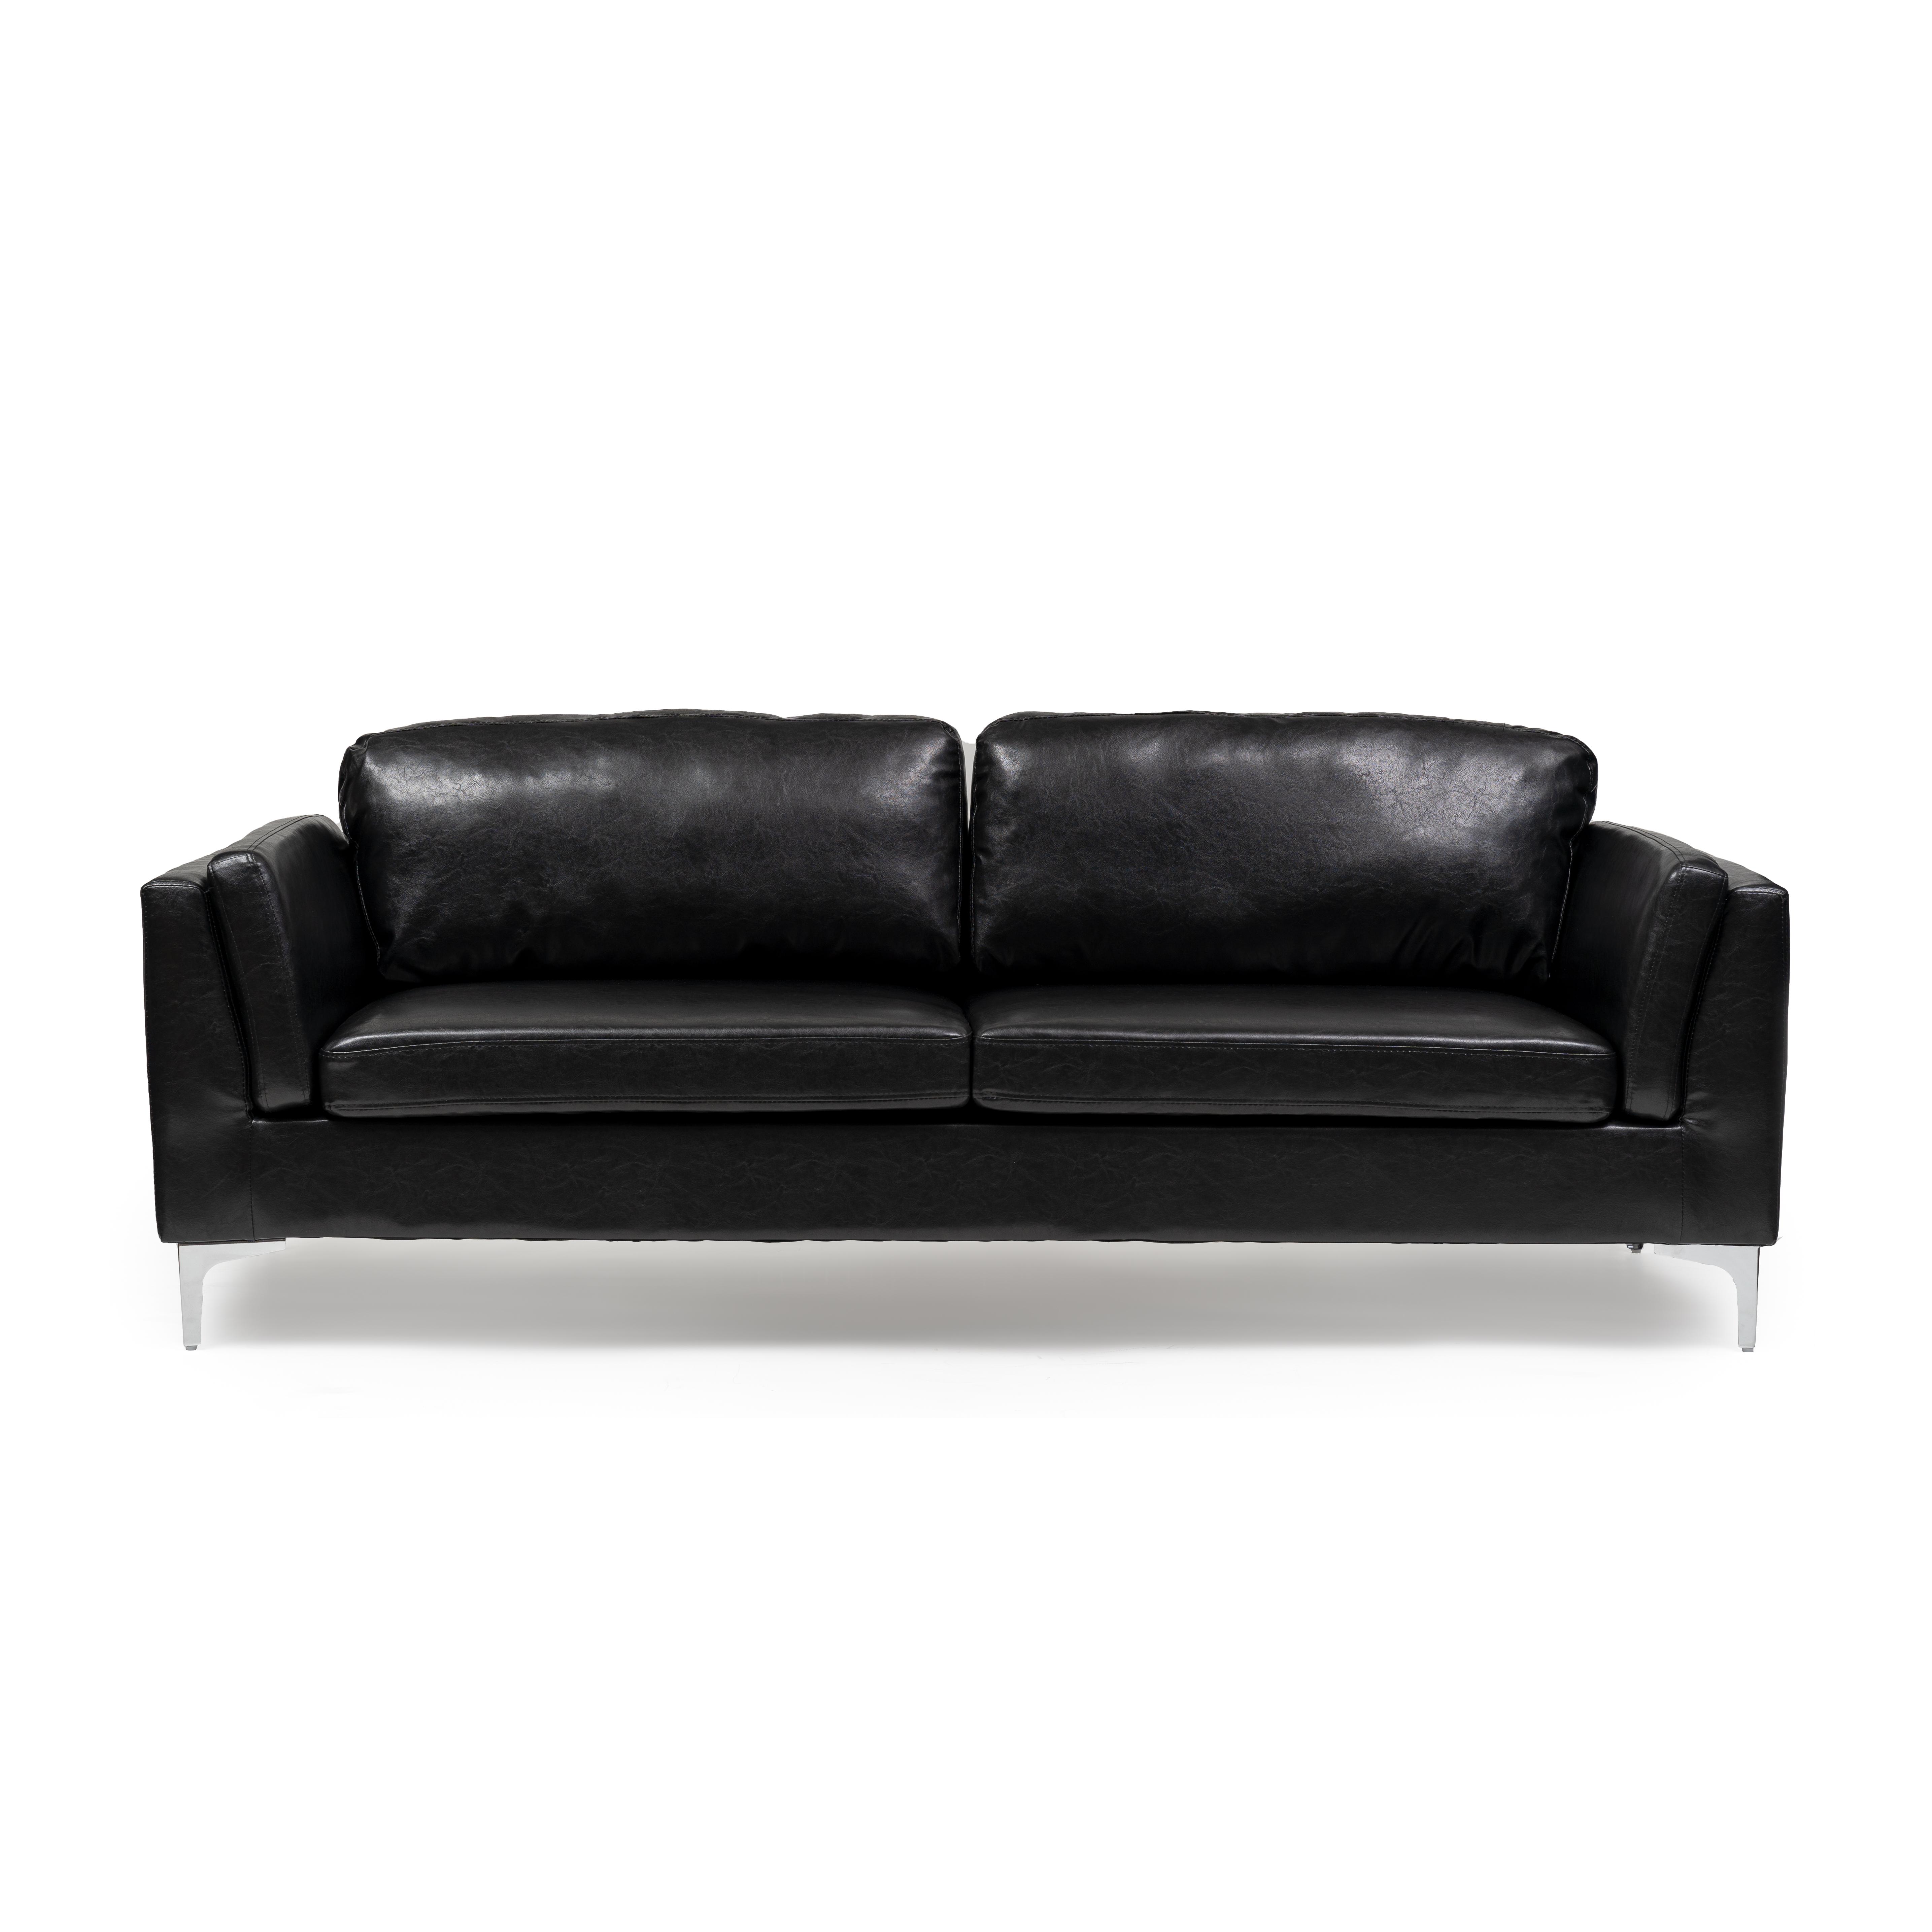 Kelly lounge диван kent черный 137213/137228